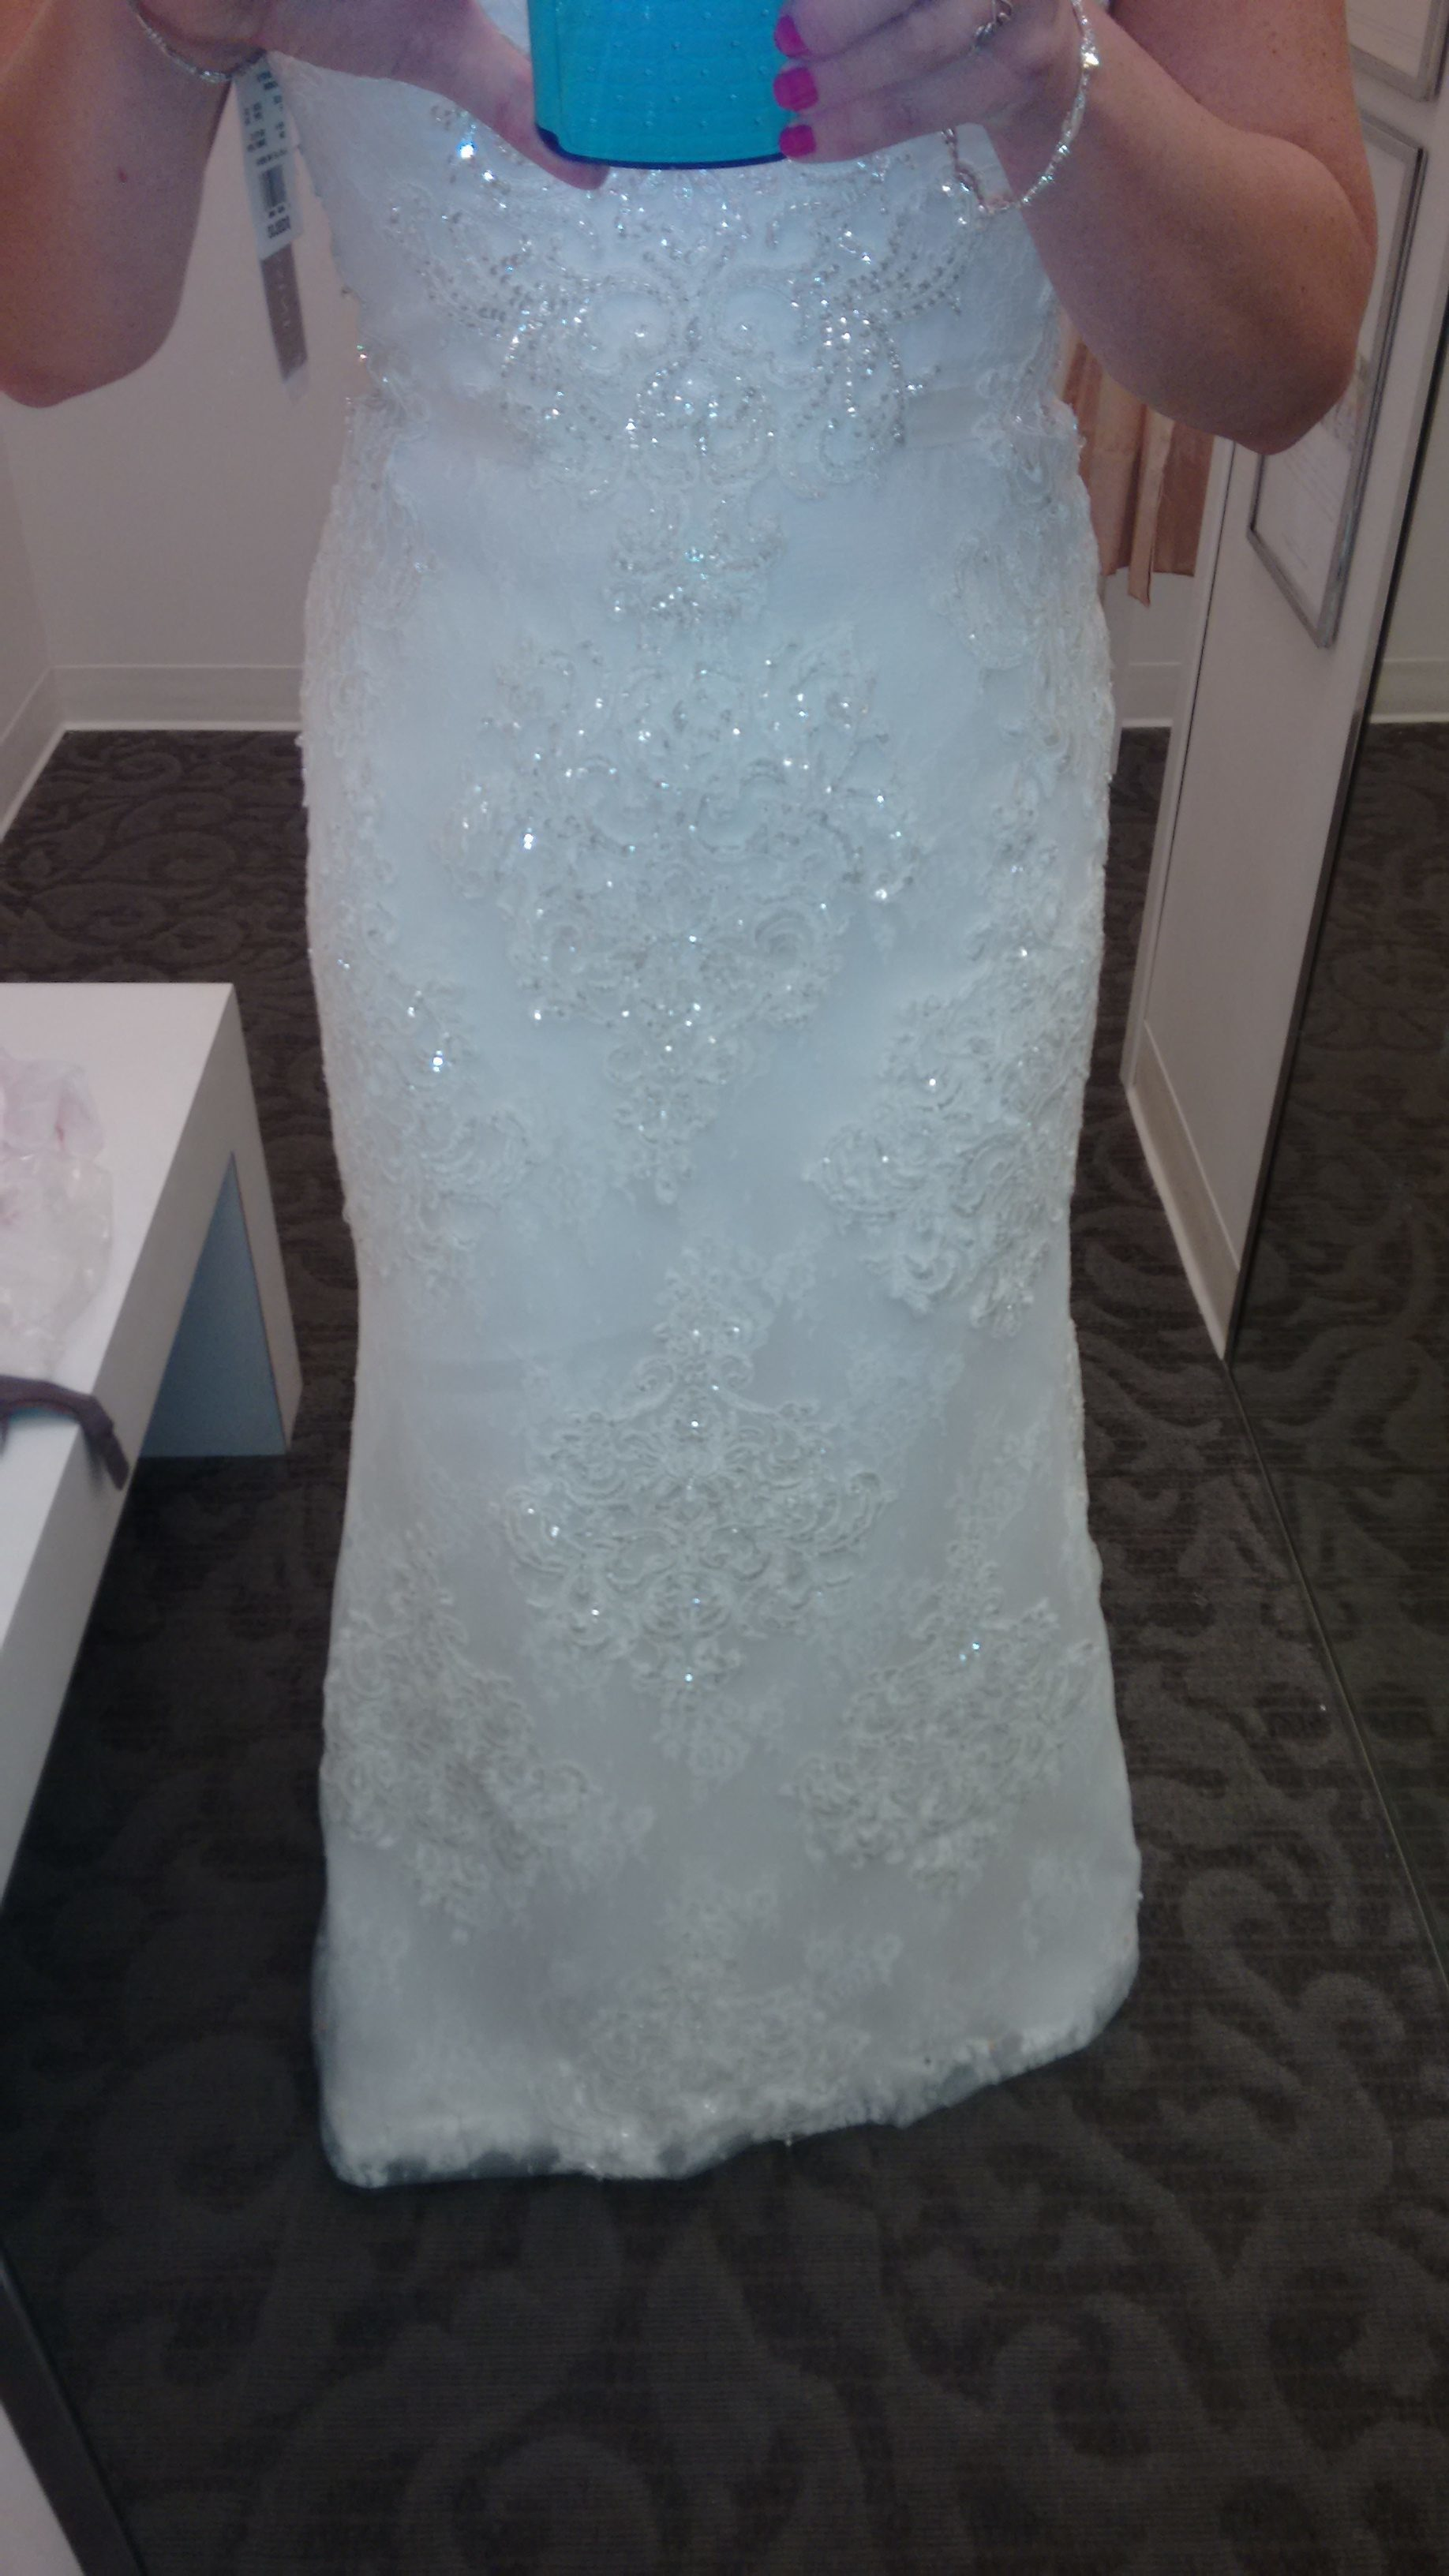 Modern Wedding Dress Steaming Cost Vignette - Wedding Plan Ideas ...